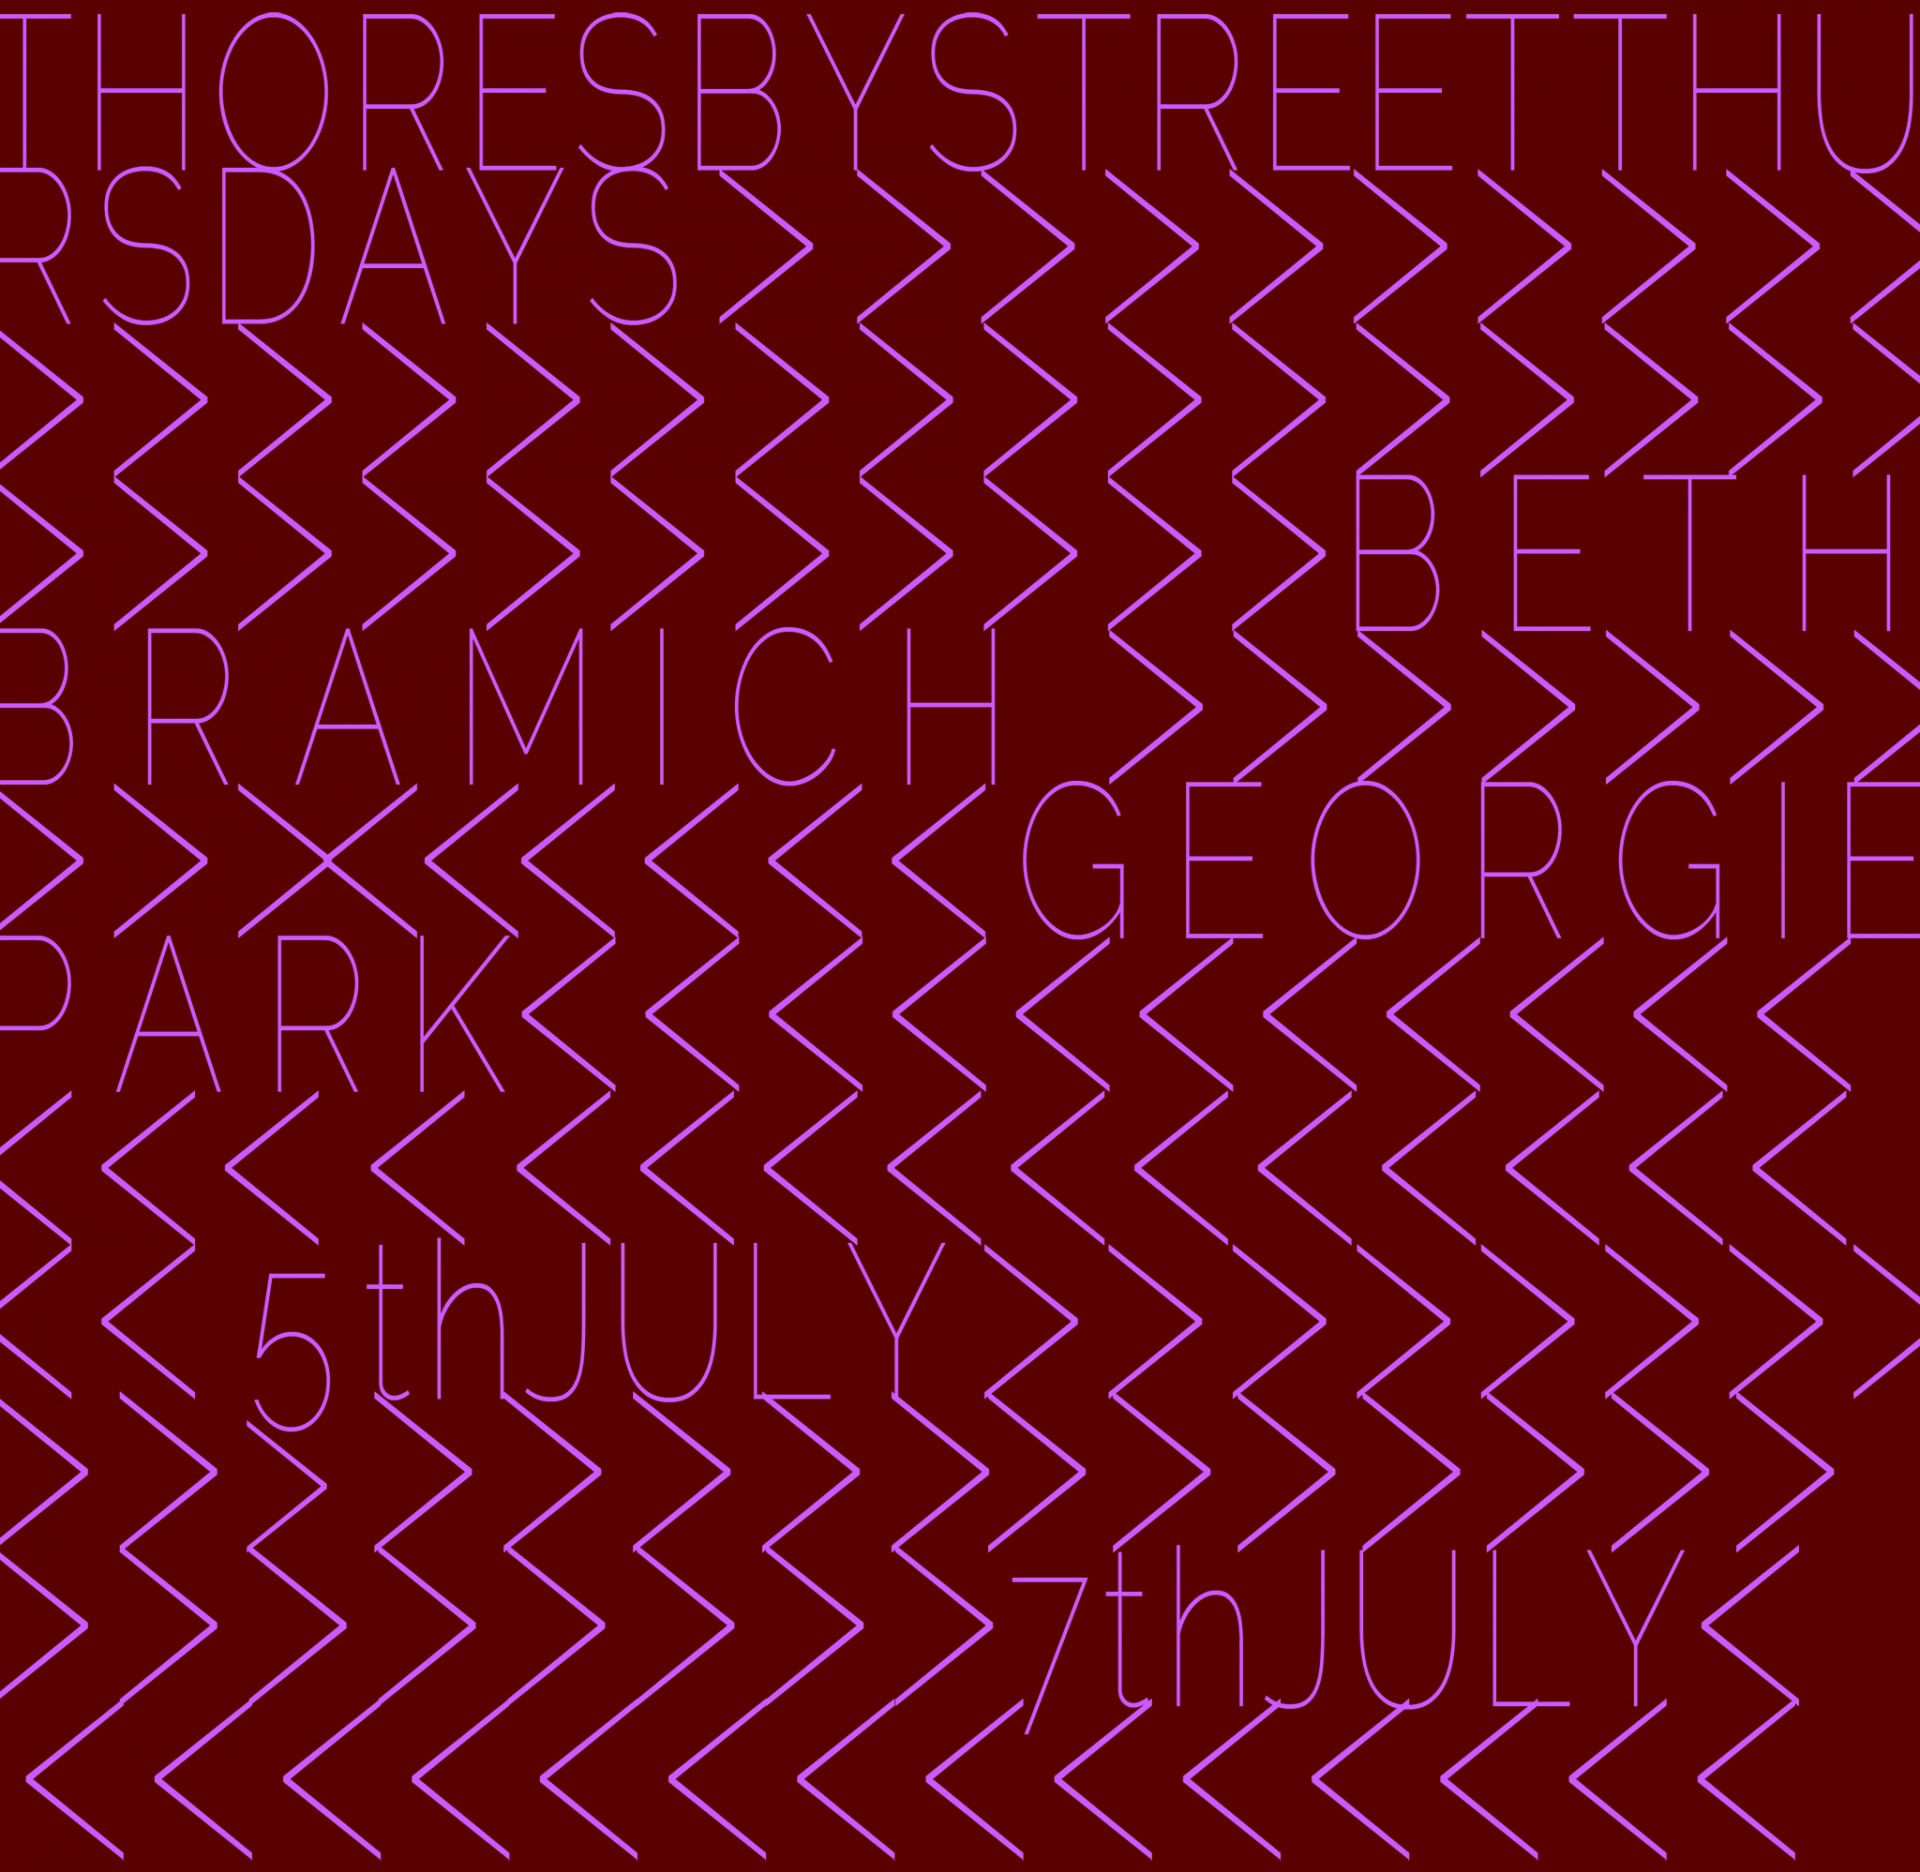 Thoresby Street Thursdays